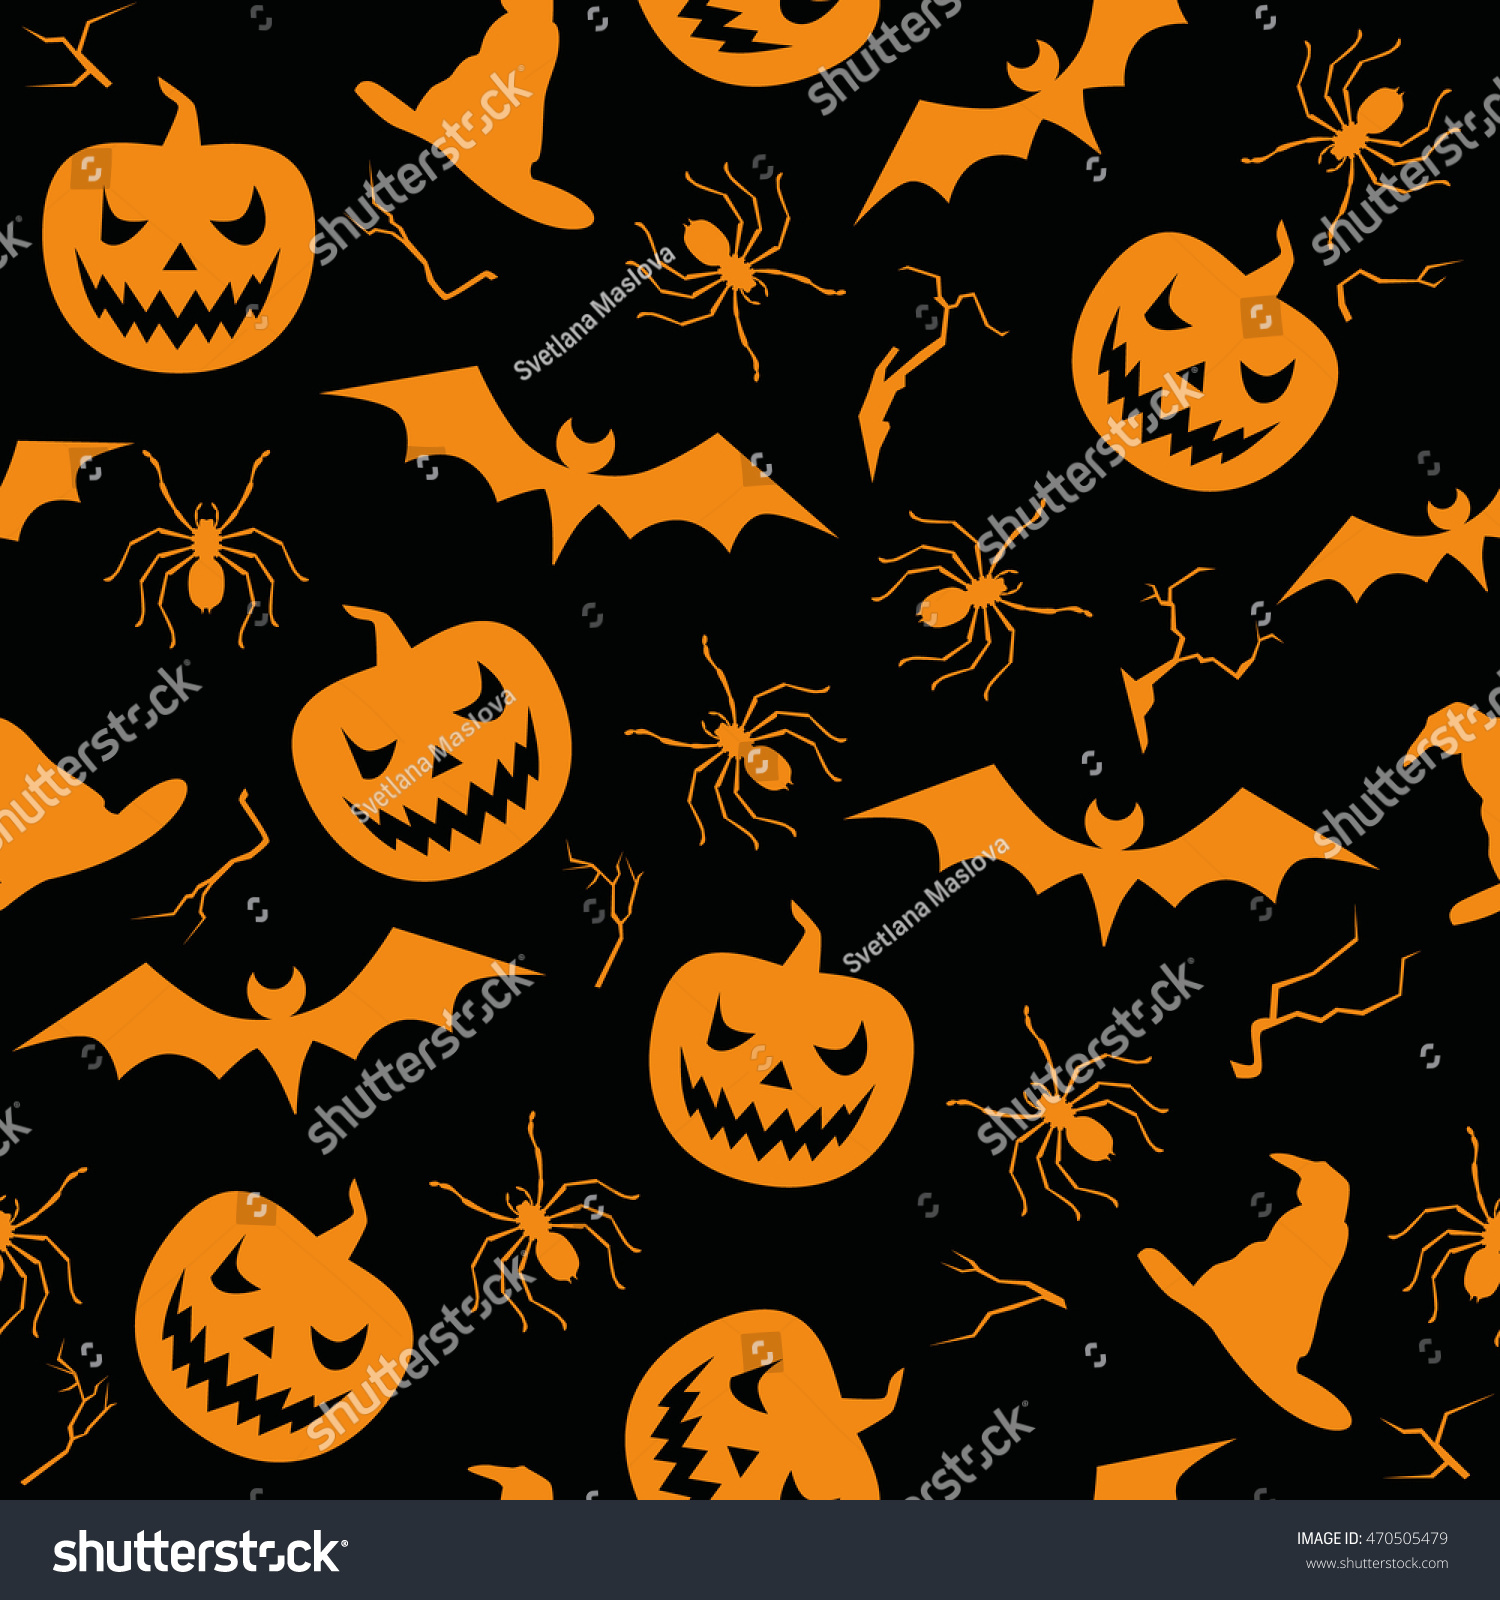 Download Wallpaper Halloween Spider - stock-vector-halloween-seamless-pattern-with-pumpkin-bat-and-spider-vector-black-wallpaper-470505479  HD_55312.jpg